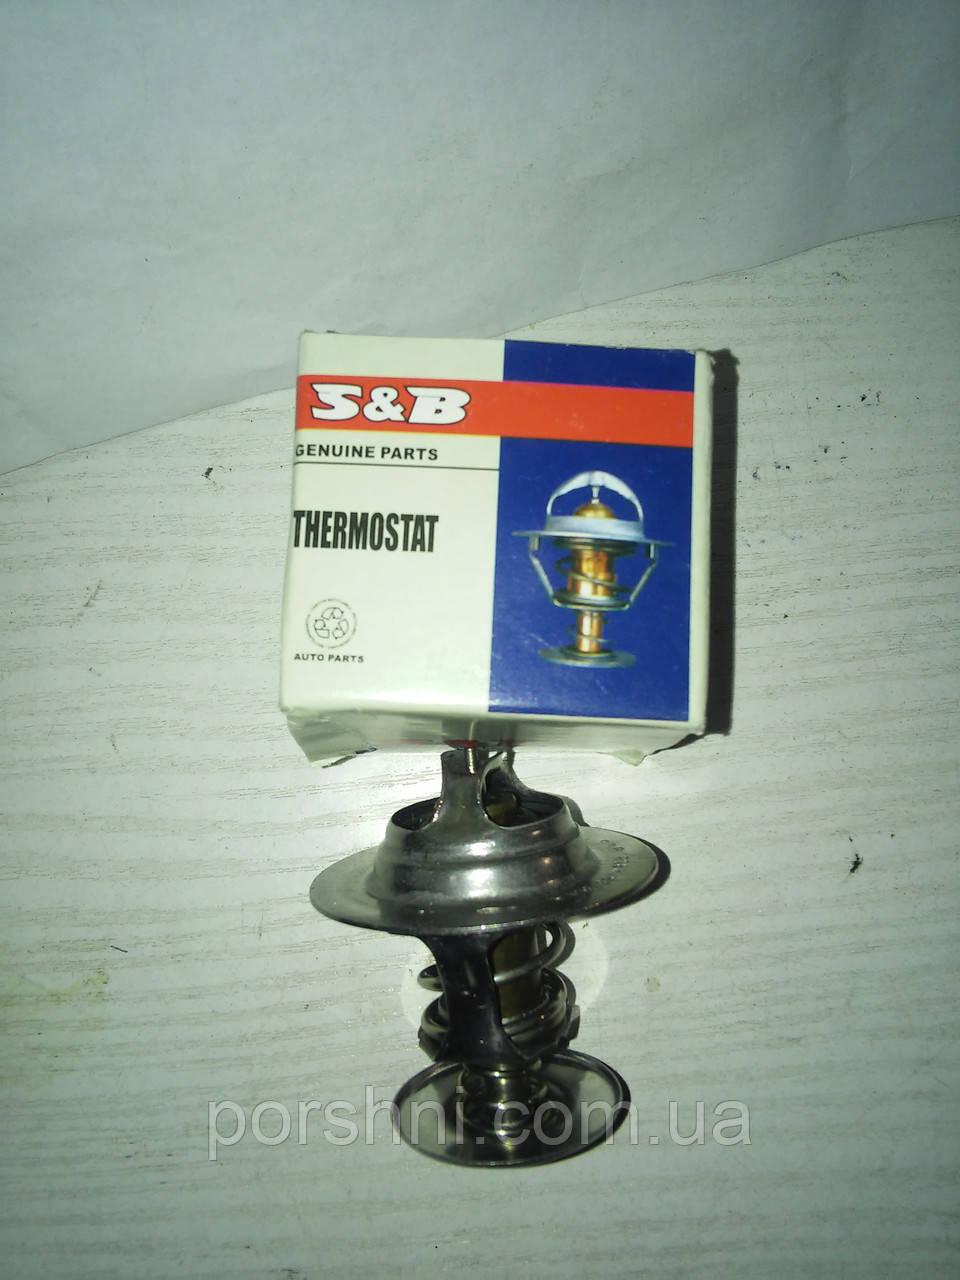 Термостат  Ford Scorpio  2.4 - 2.9 V 6  1,6 - 2,0 Zetec .Тransit  92 -- S&B  89FF8575AB